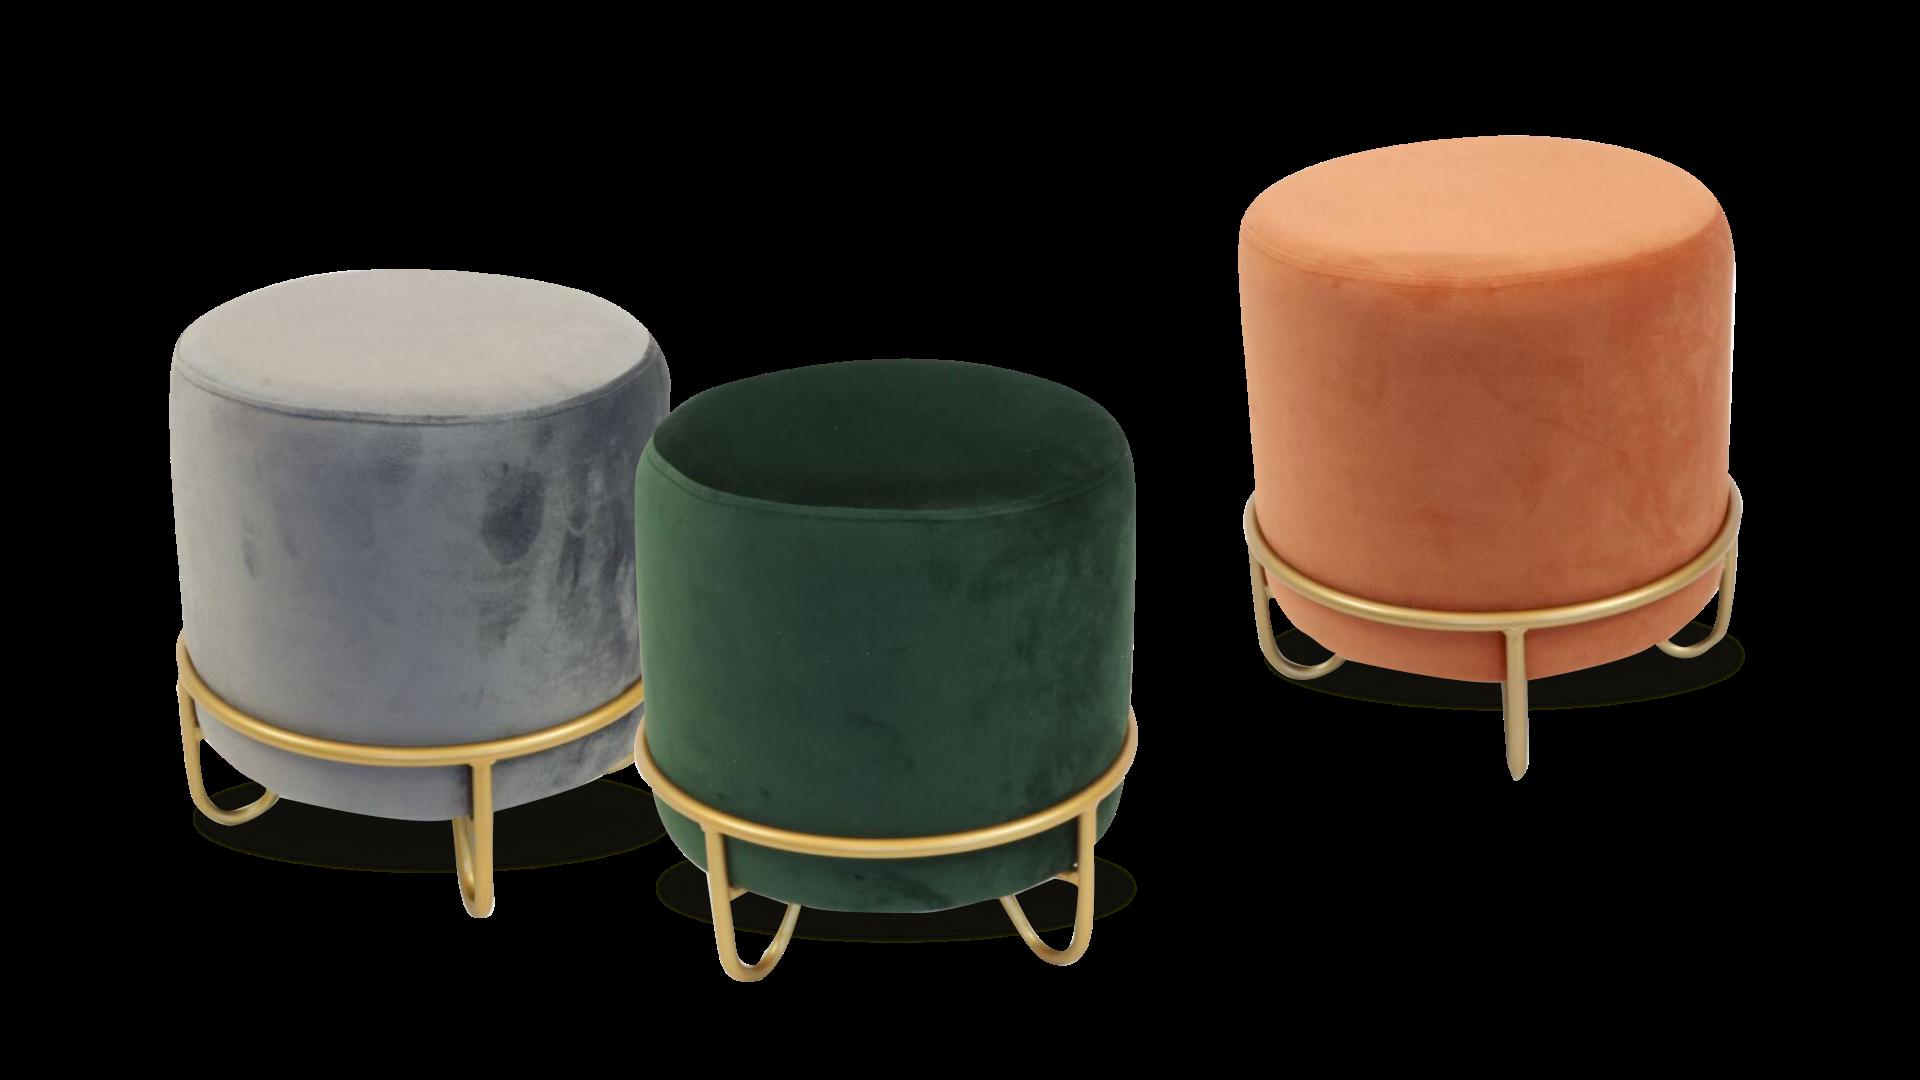 Tabure Fiebe sandstone (35x37 cm) dolazi u tri boje: sivoj, narančastoj i zelenoj, Pevex, 249 kn